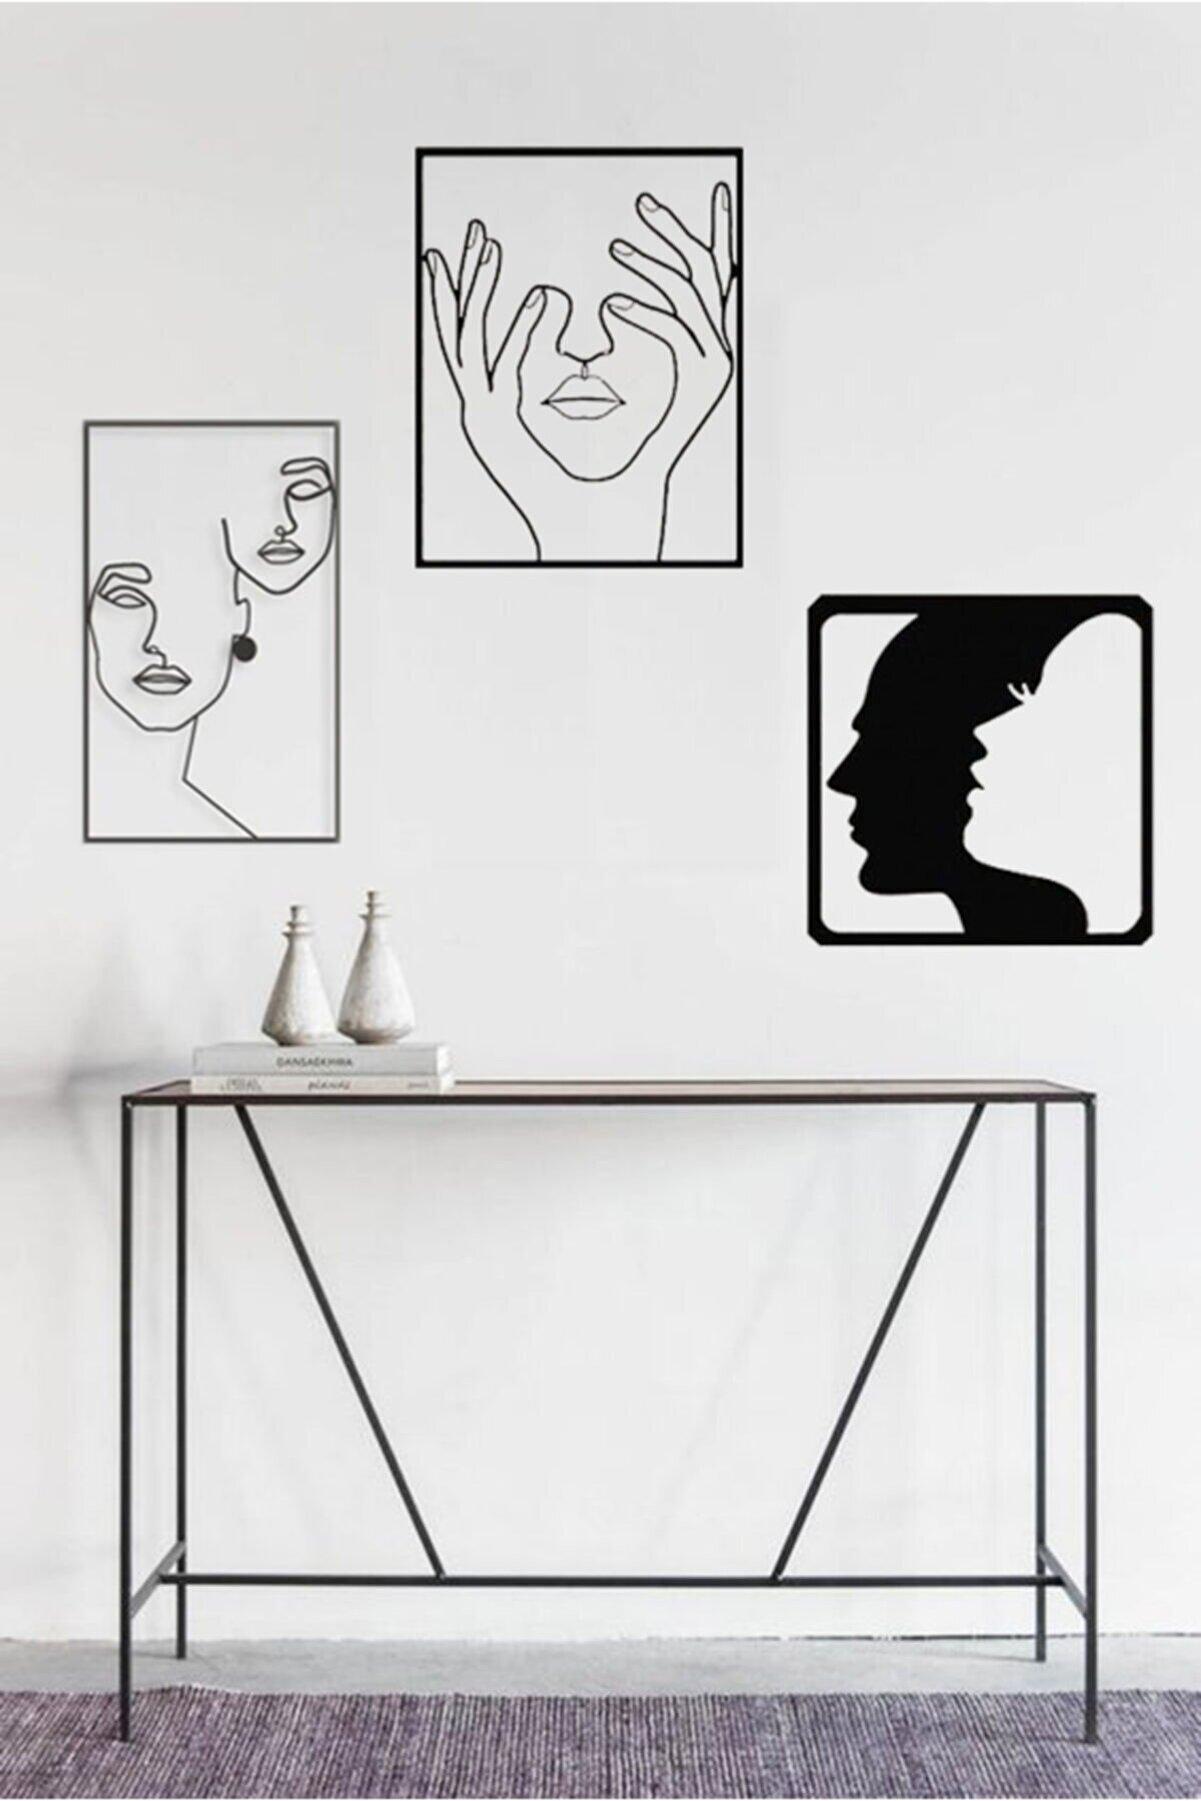 Taktakicat Muhteşem Üçlü Ahşap Dekoratif Tablo 1